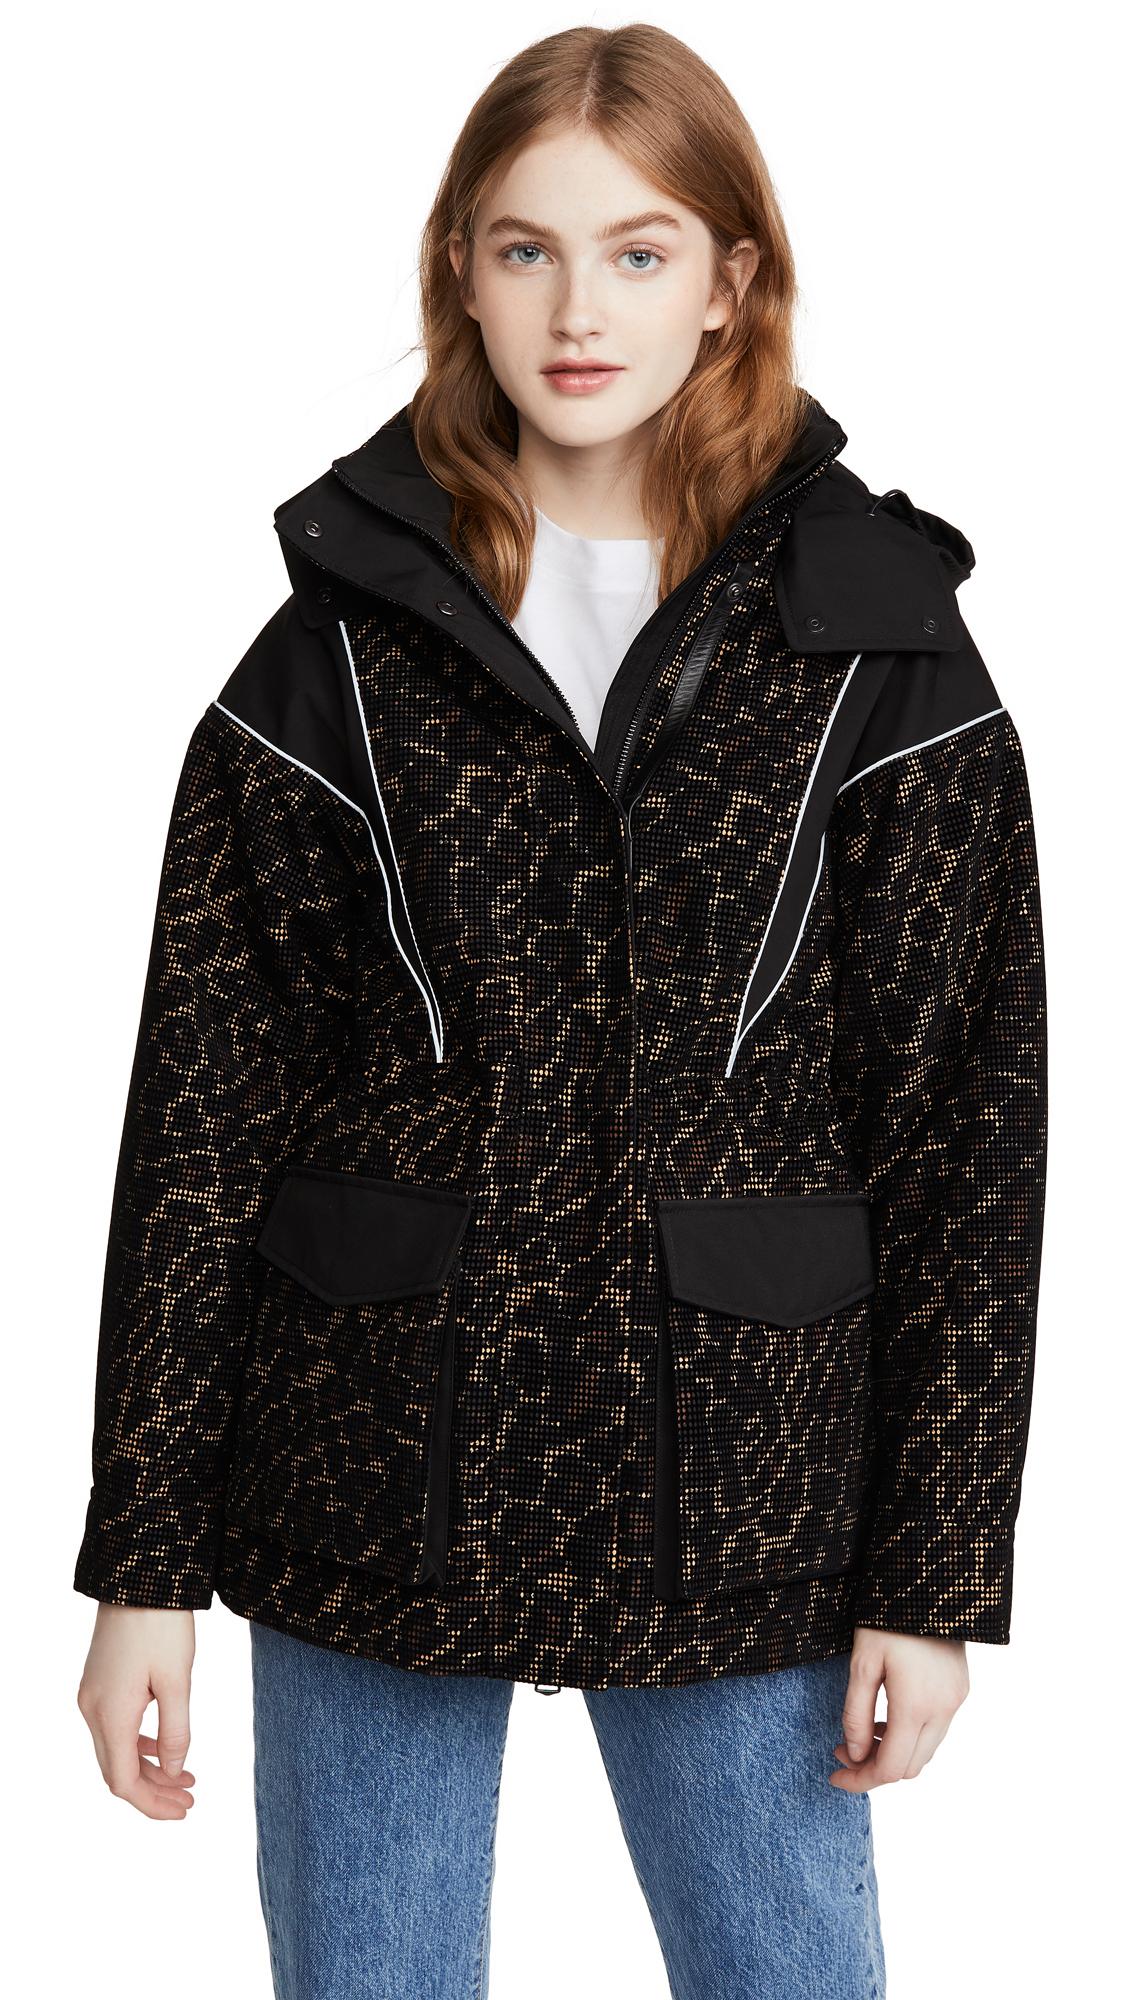 Buy Mackage Simona Jacket online beautiful Mackage Jackets, Coats, Down Jackets